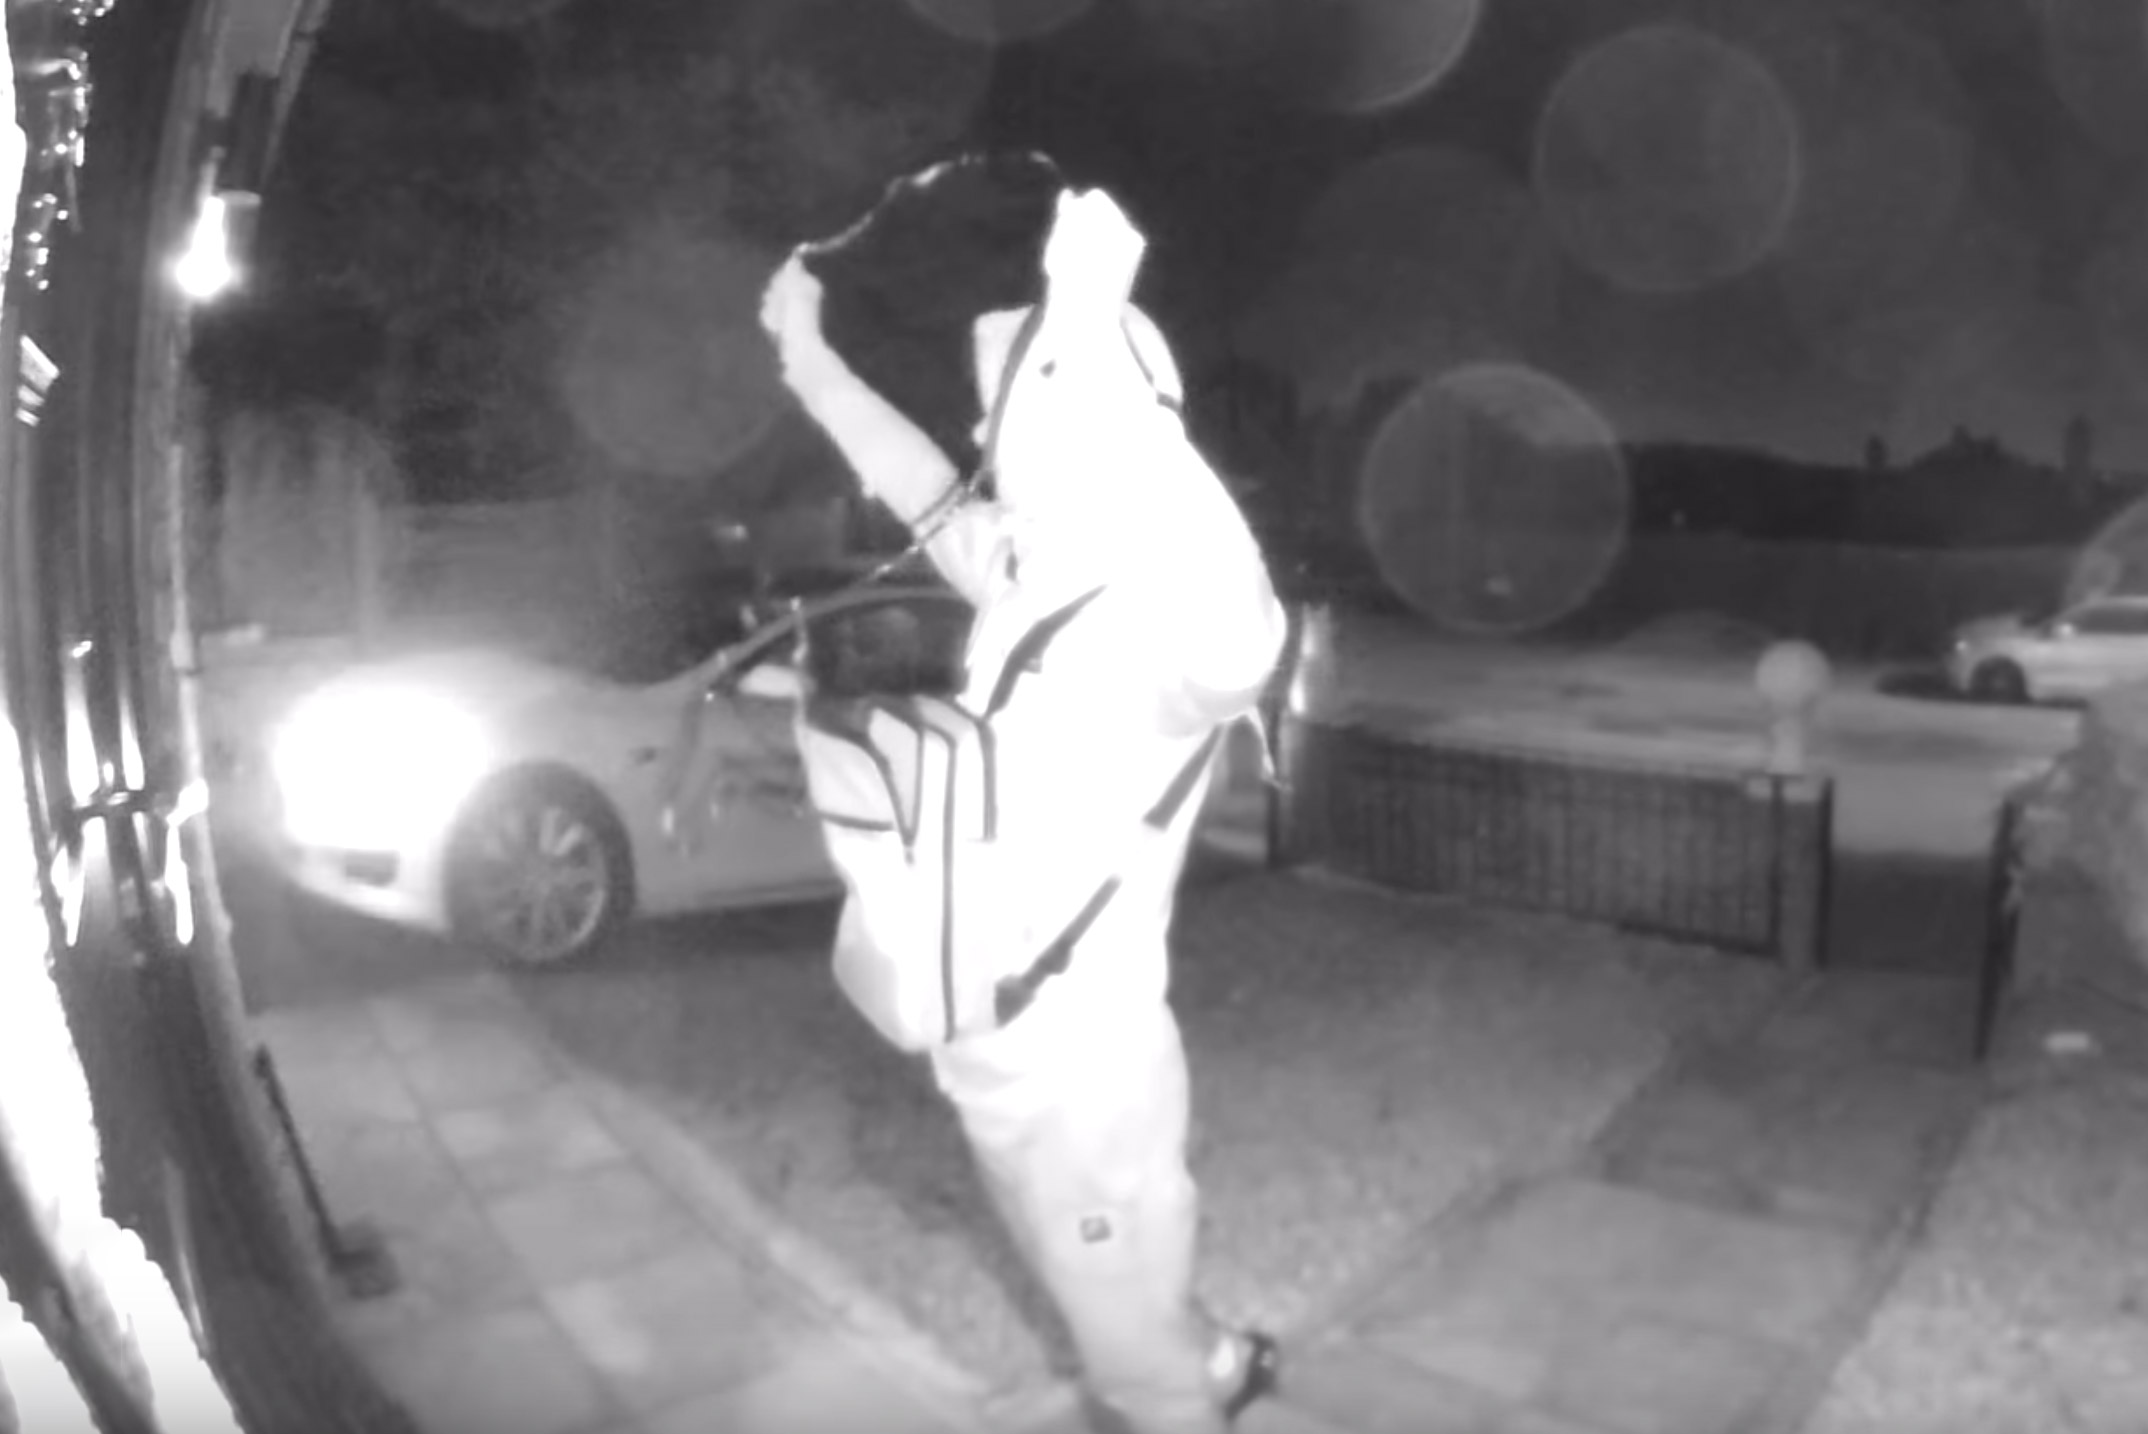 Thieves Keyless Hack Tesla